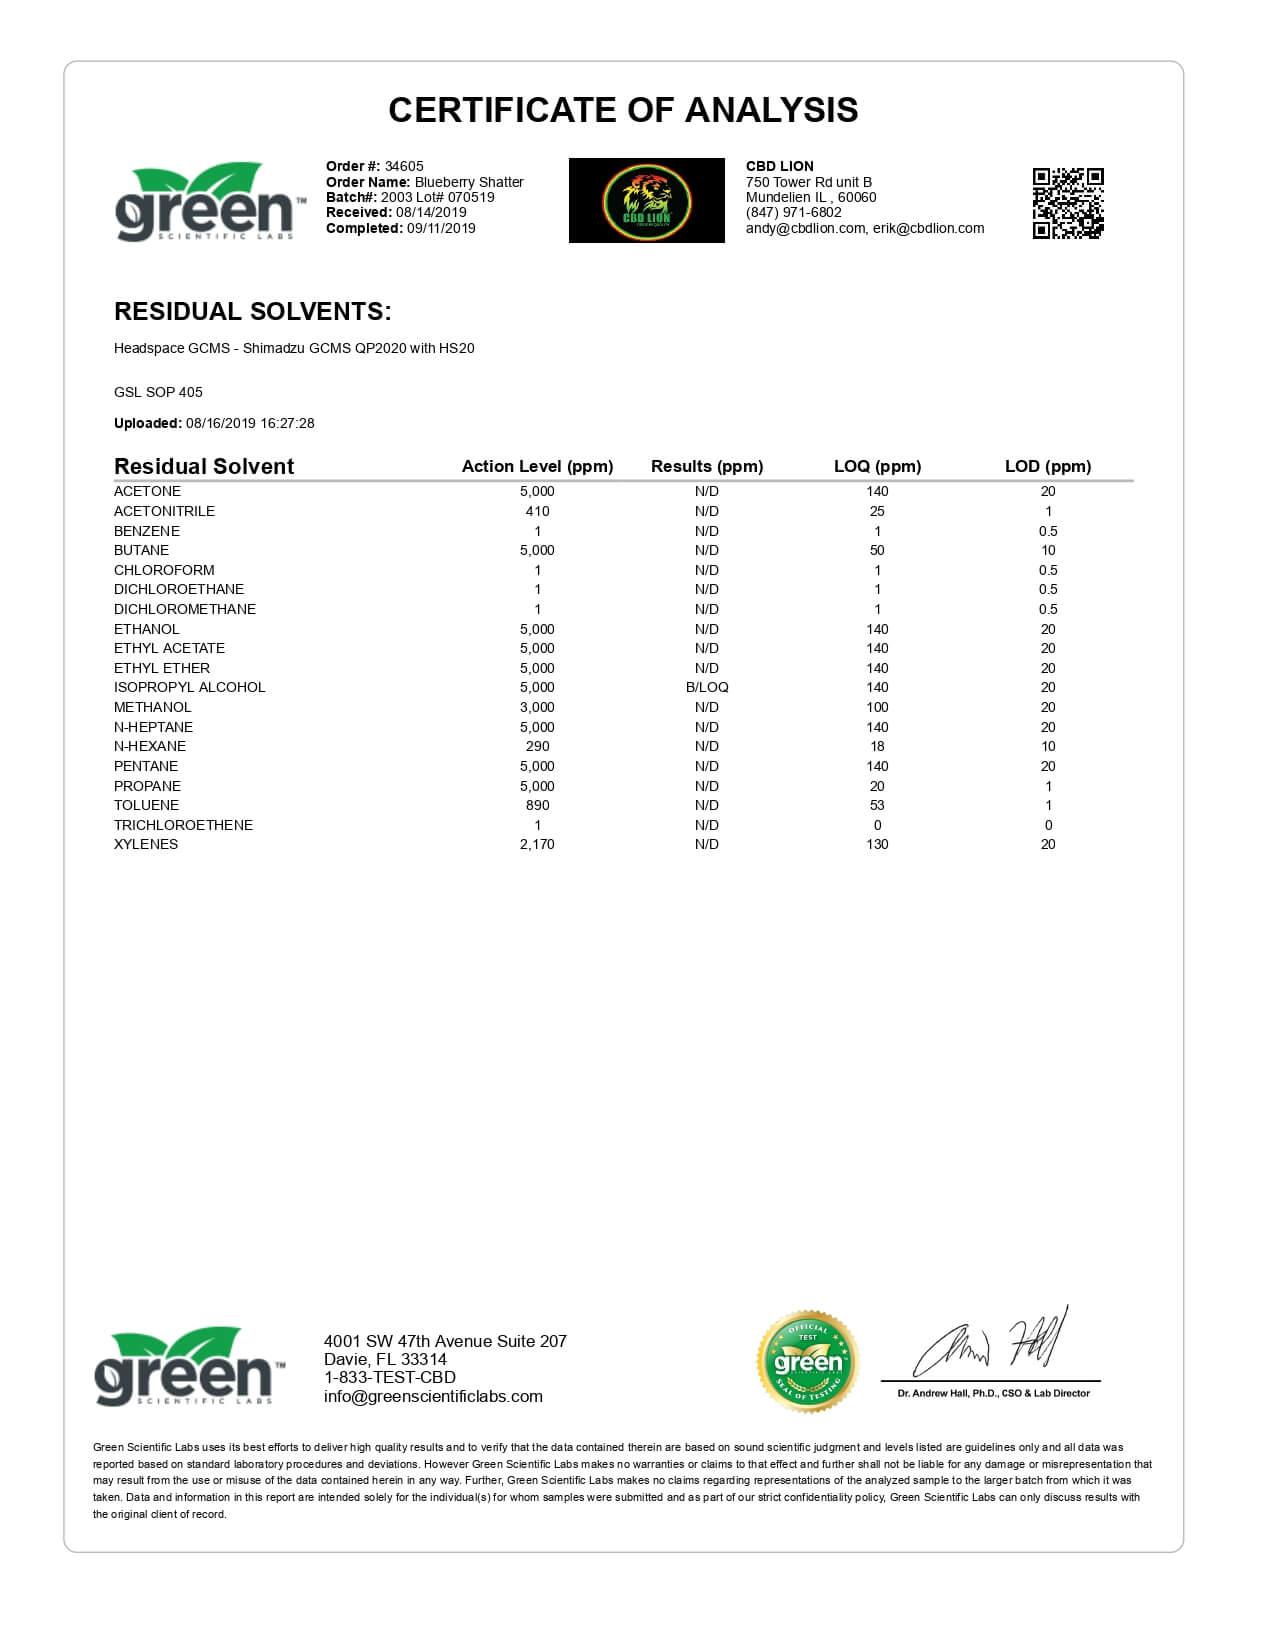 CBD Lion CBD Concentrate Blueberry Shatter 0.5g Lab Report